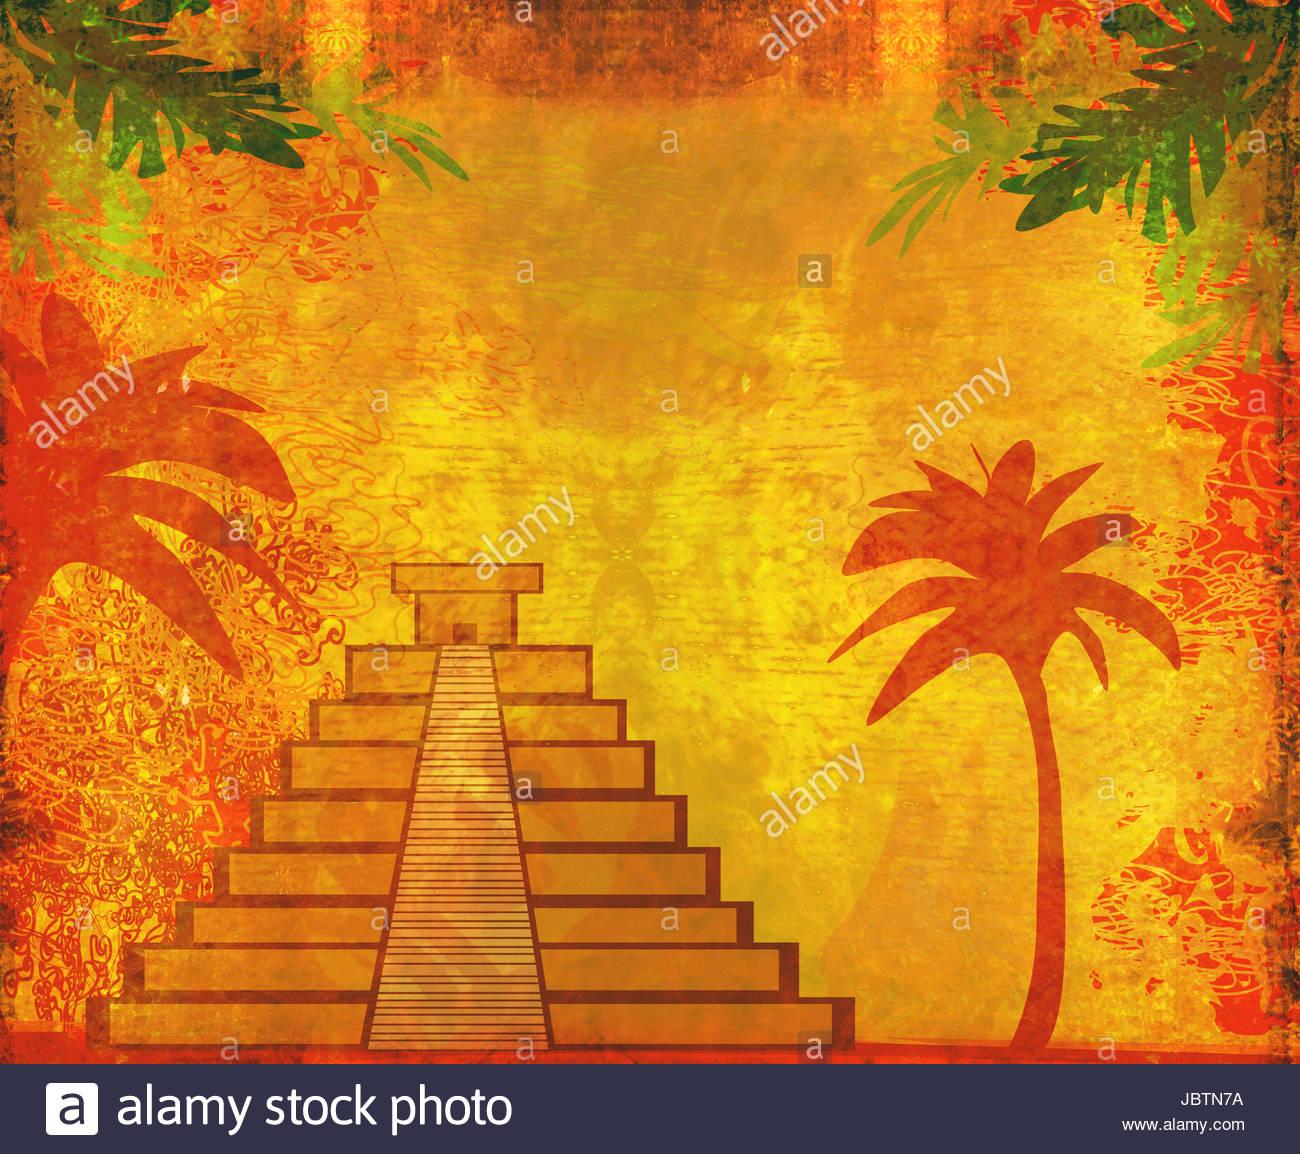 Mayan Pyramid Chichen Itza Mexico   grunge abstract background 1300x1154